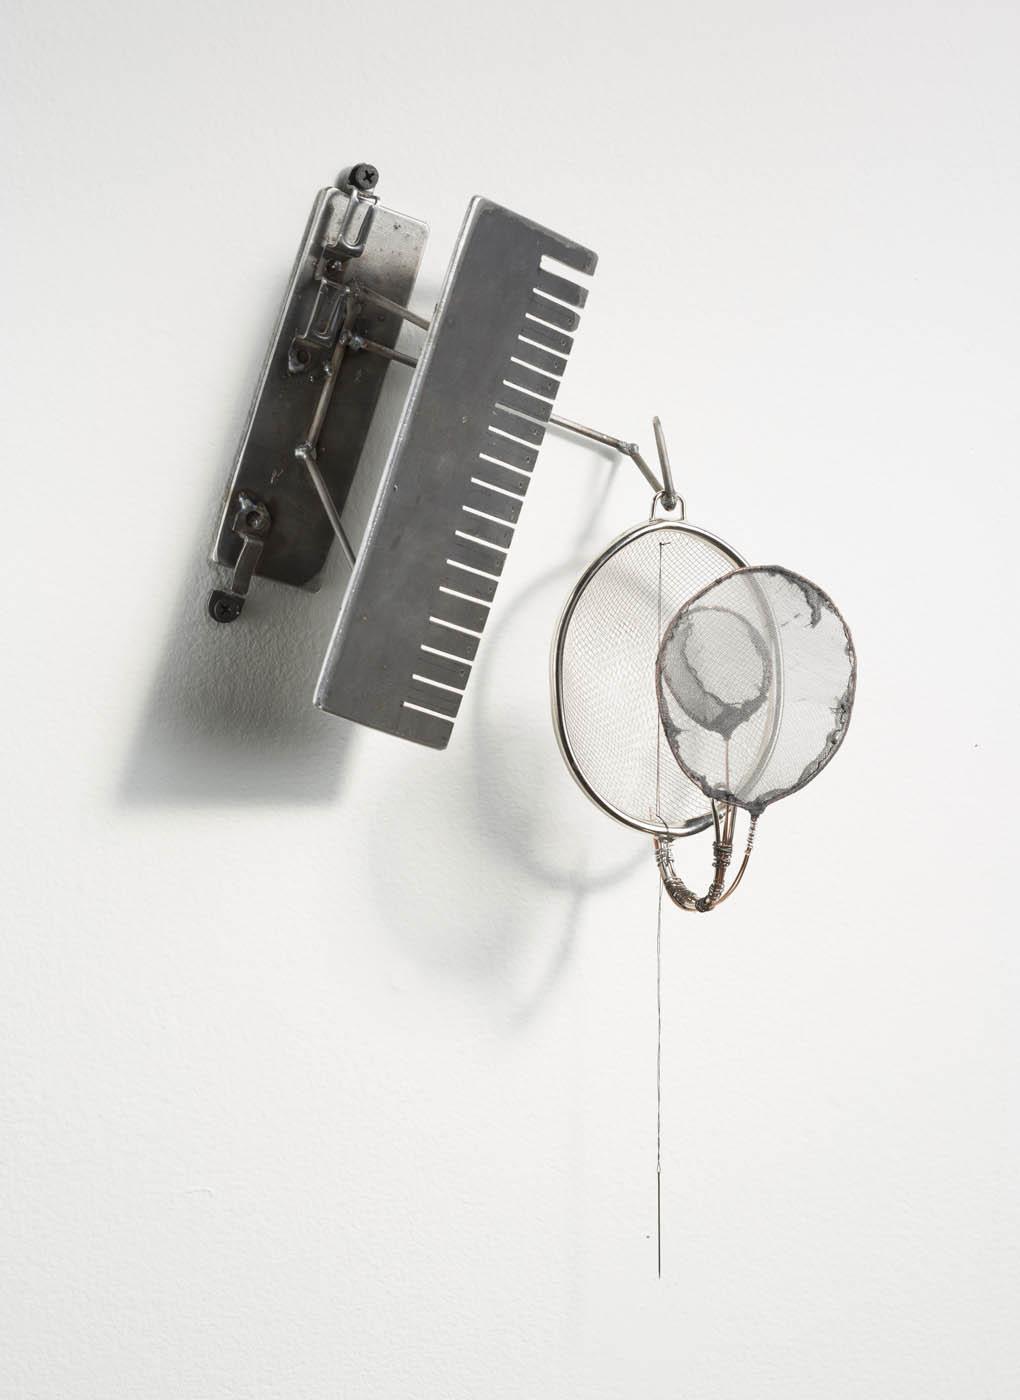 Lei Zhang - Untitled